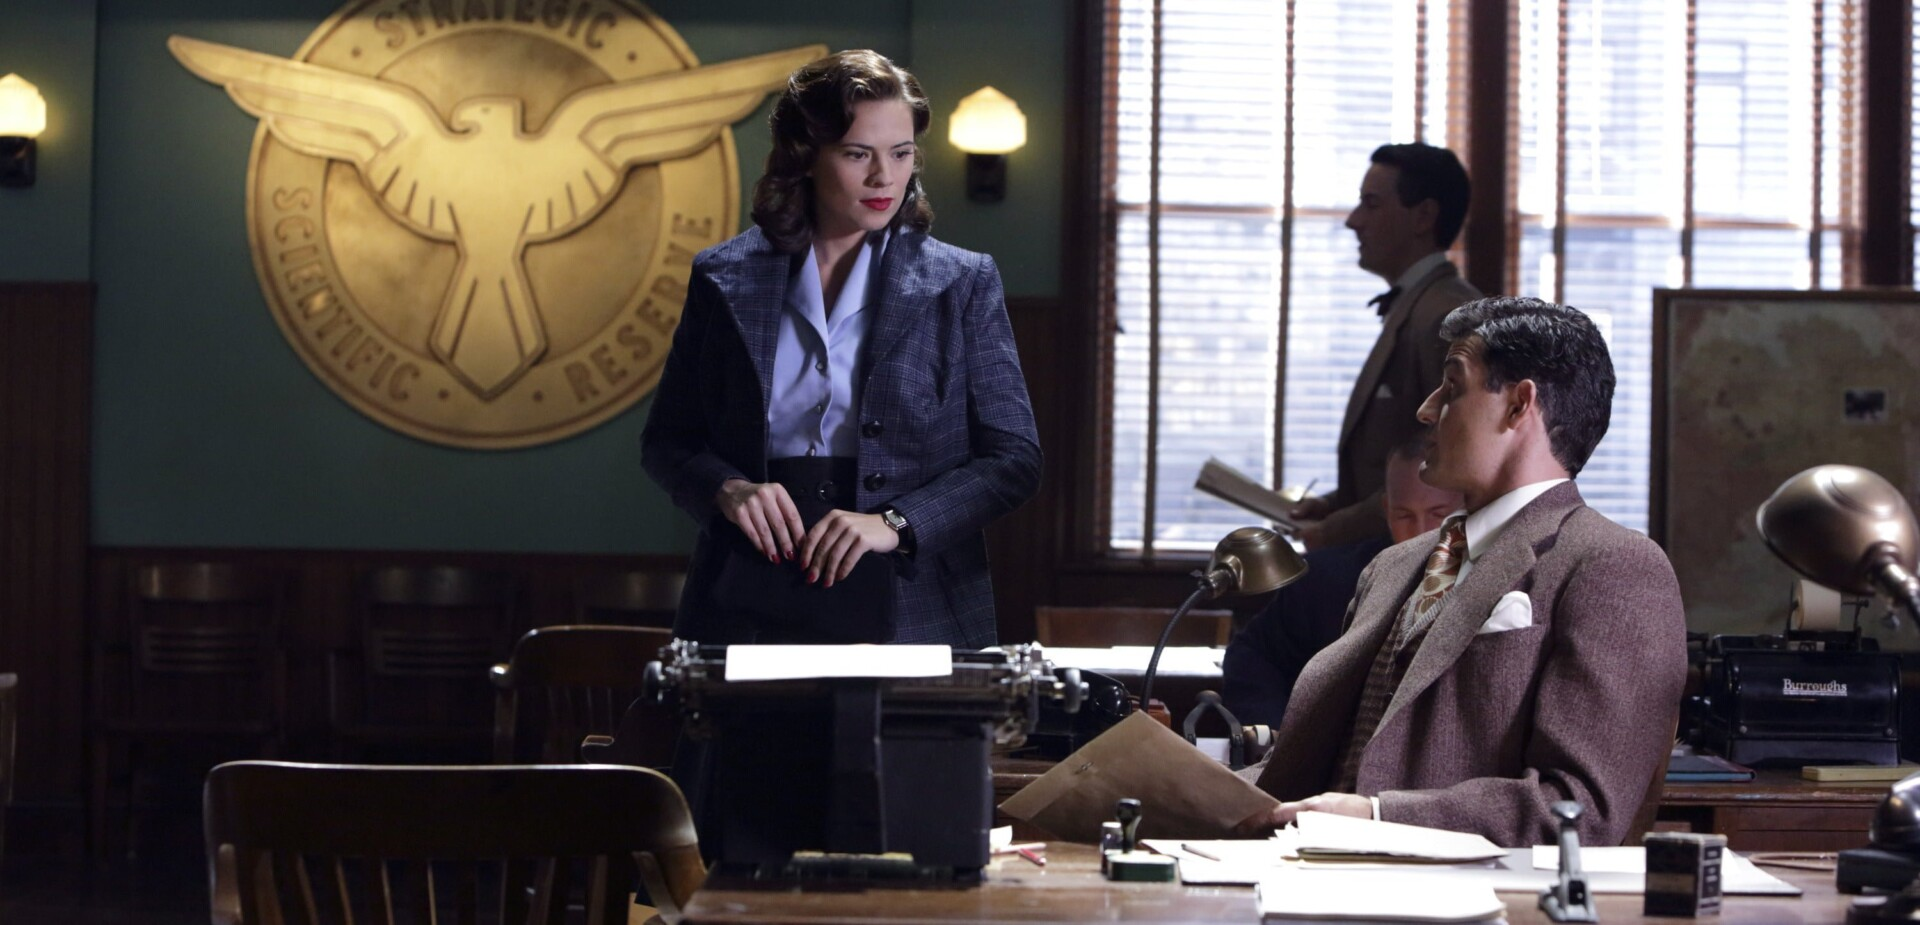 Marvel'S Agent Carter - 5 Motivi Per Guardare La Serie Su Disney+ 6 - Hynerd.it